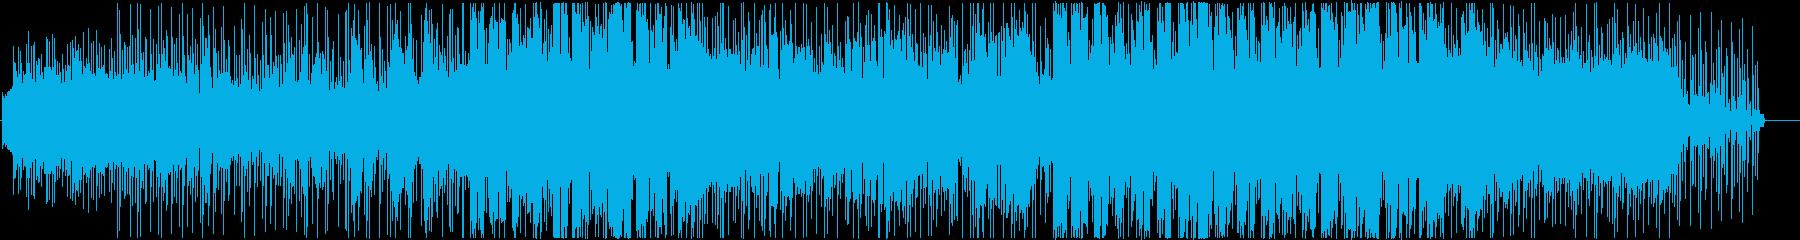 maboroshiの再生済みの波形